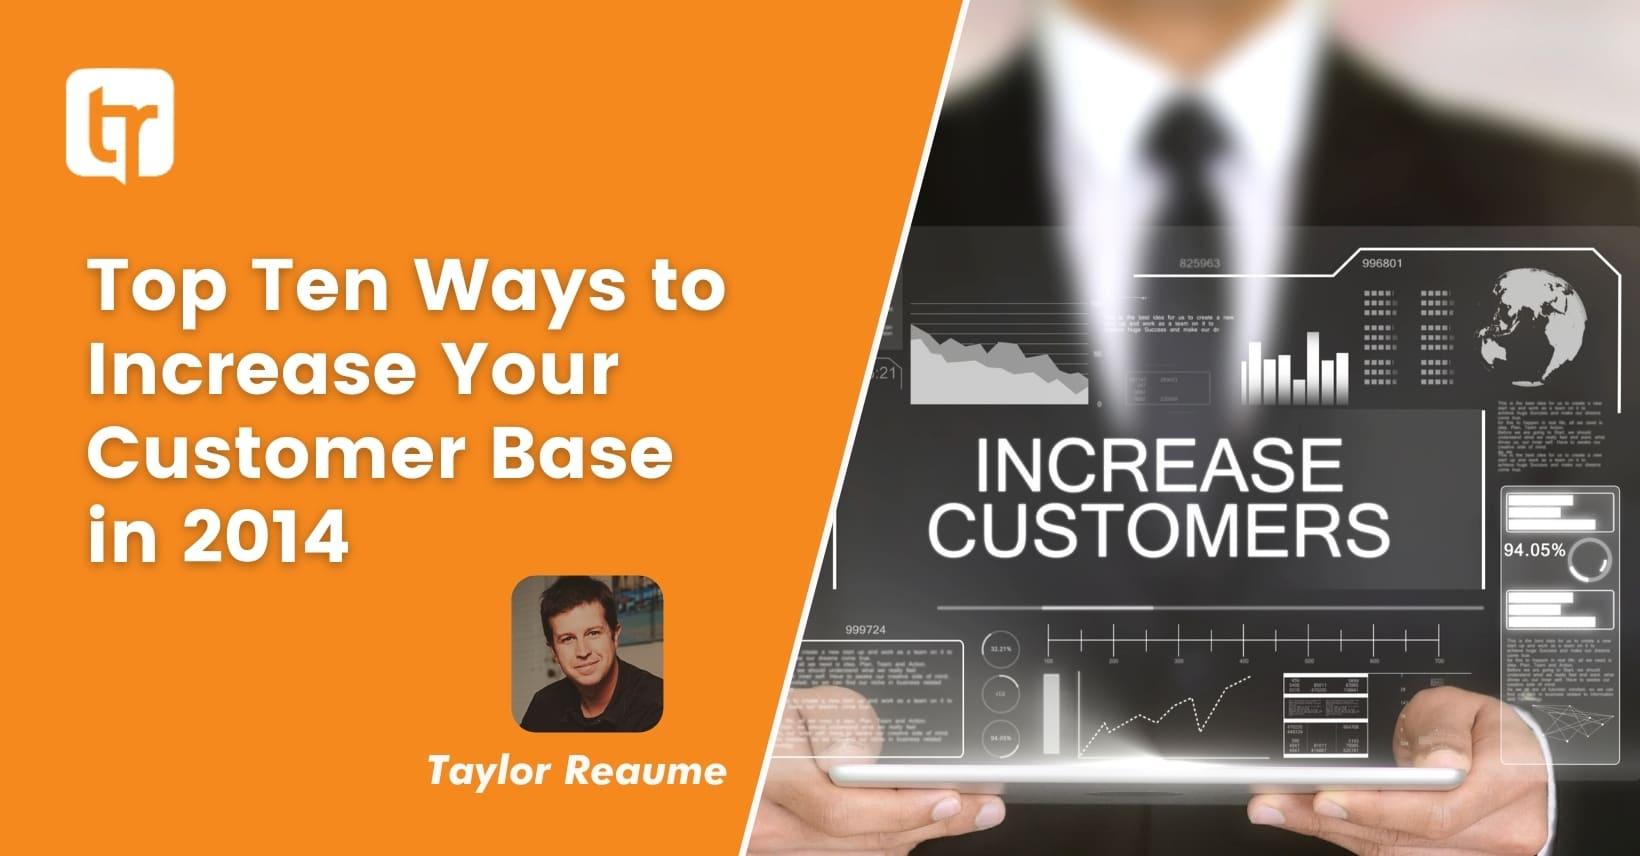 Top Ten Ways to Increase Your Customer Base in 2014